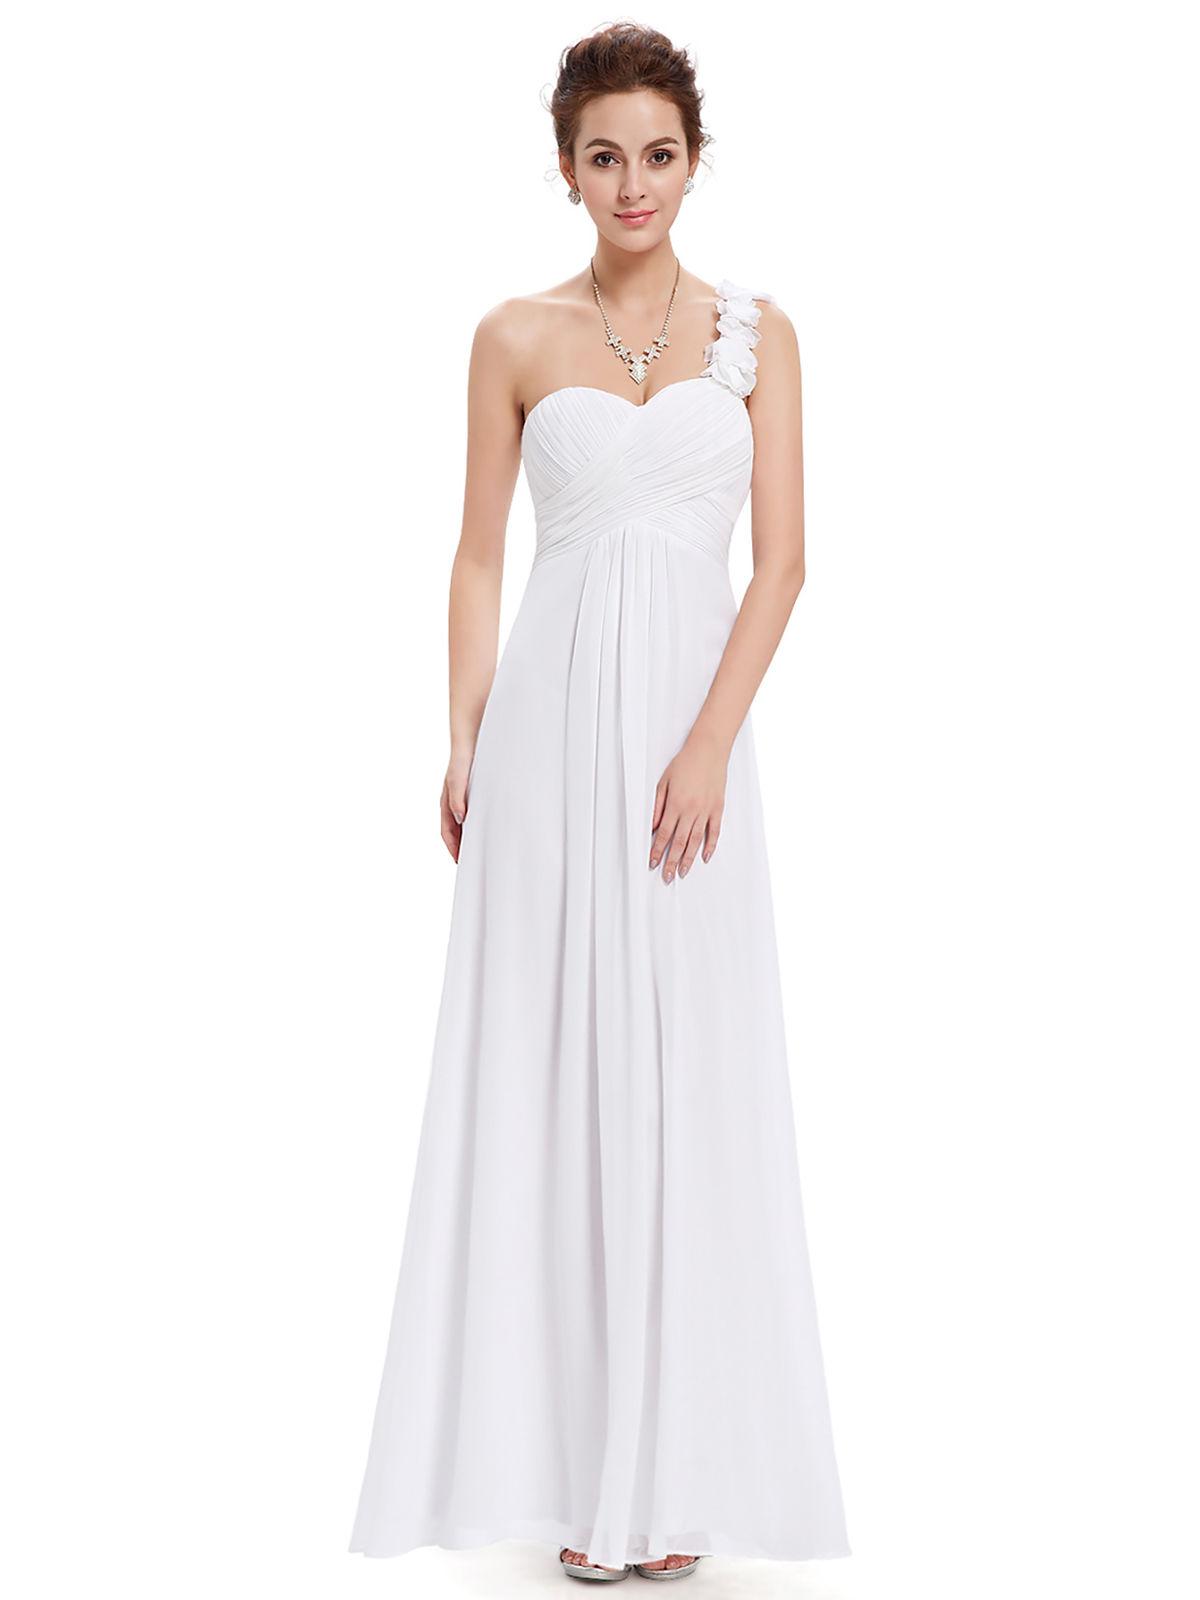 355e1a2759b Long One Shoulder Chiffon Bridesmaid Dresses